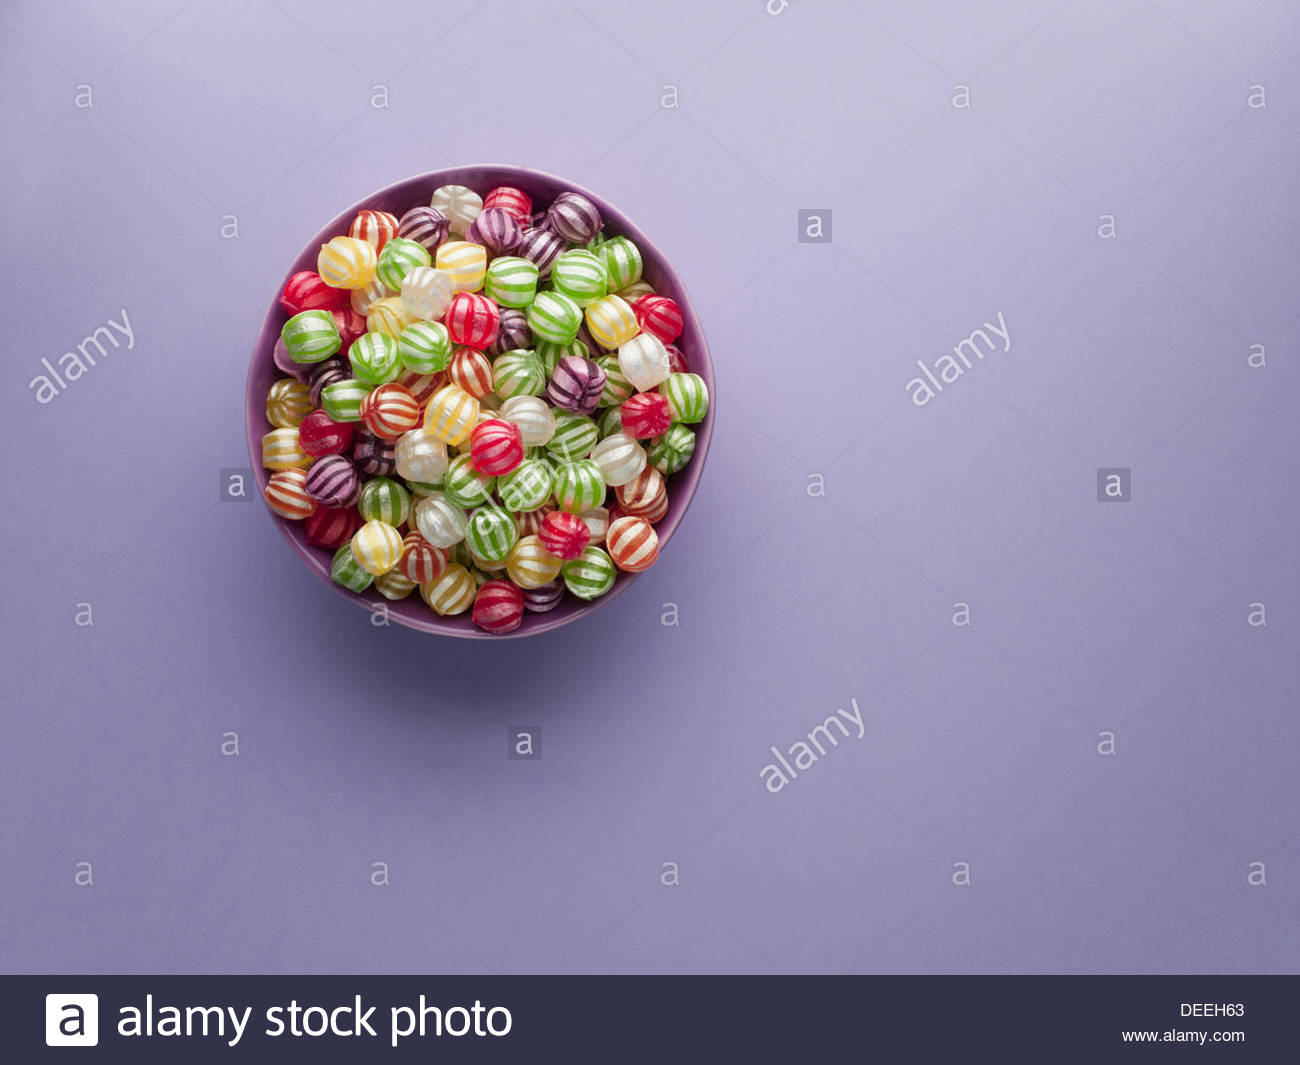 Bonbons durs dans un bol vibrant Photo Stock